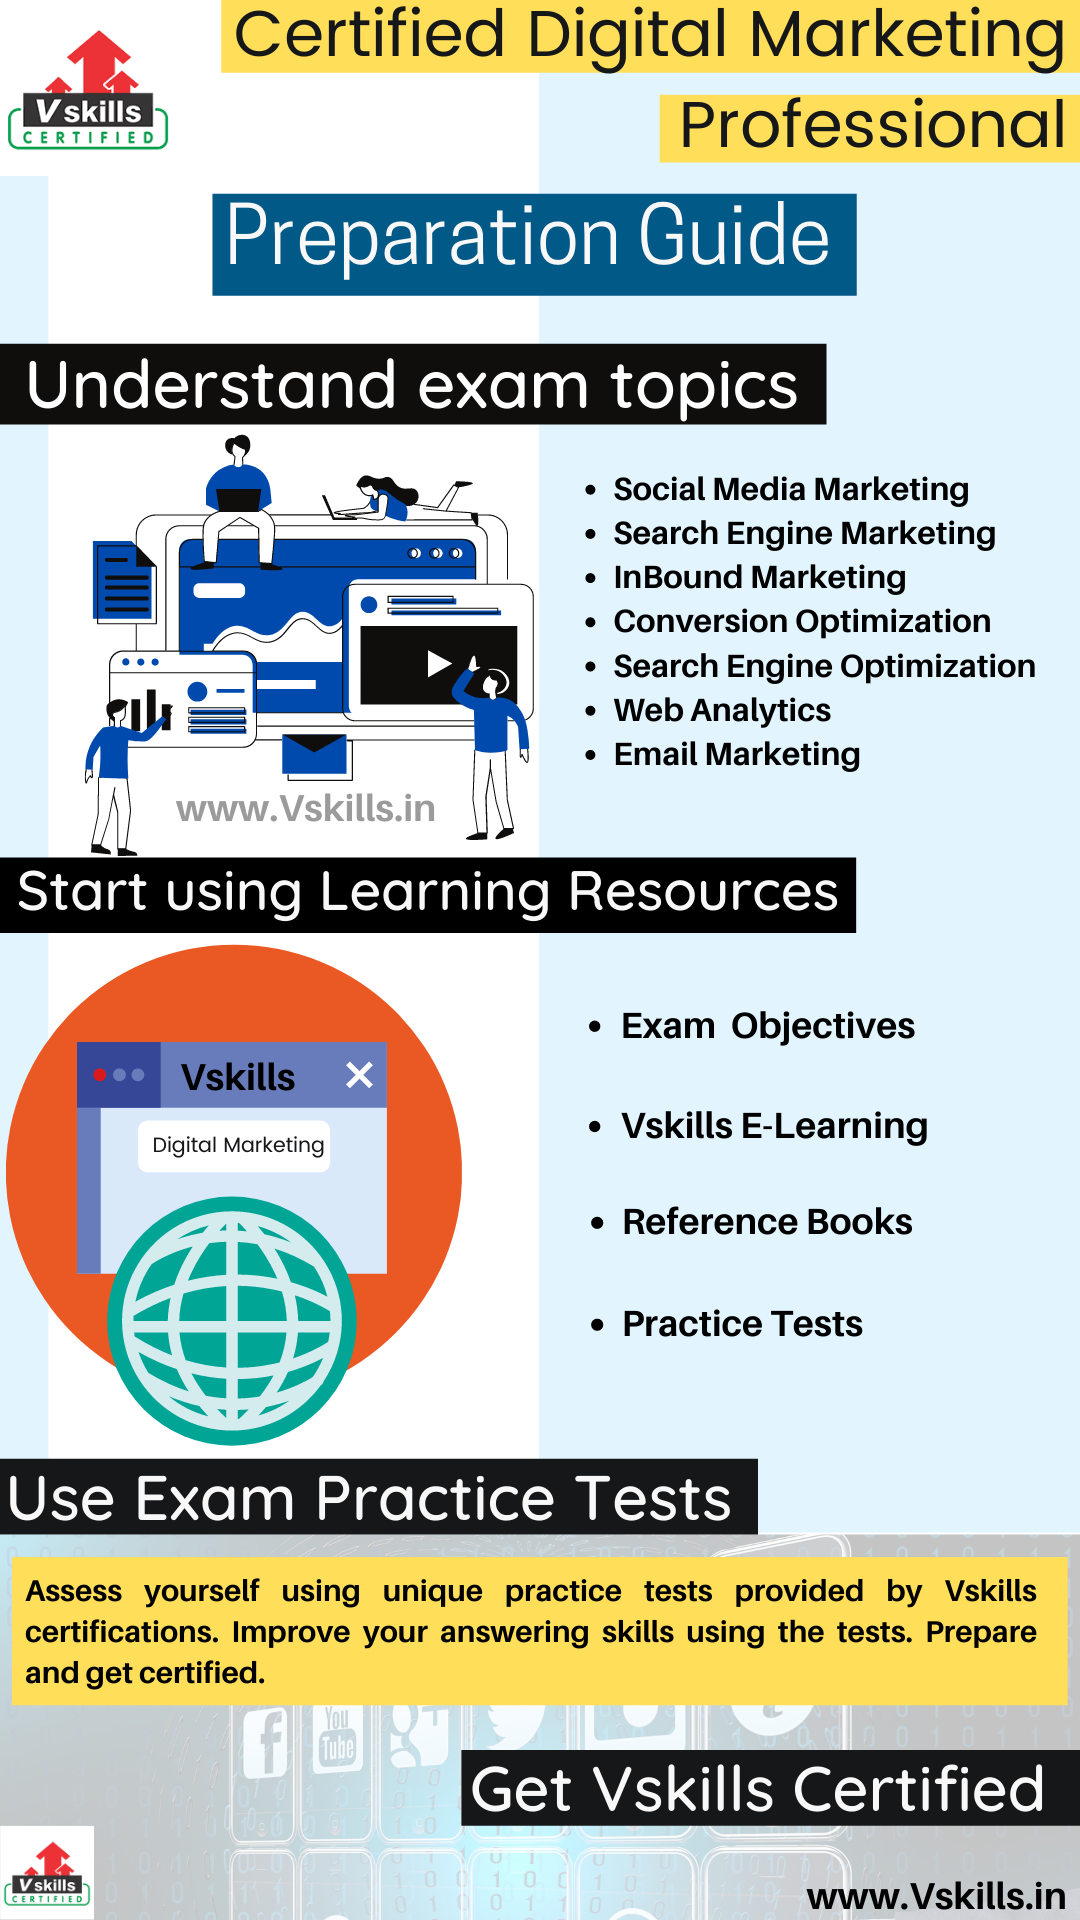 Certified Digital Marketing Professional study guide